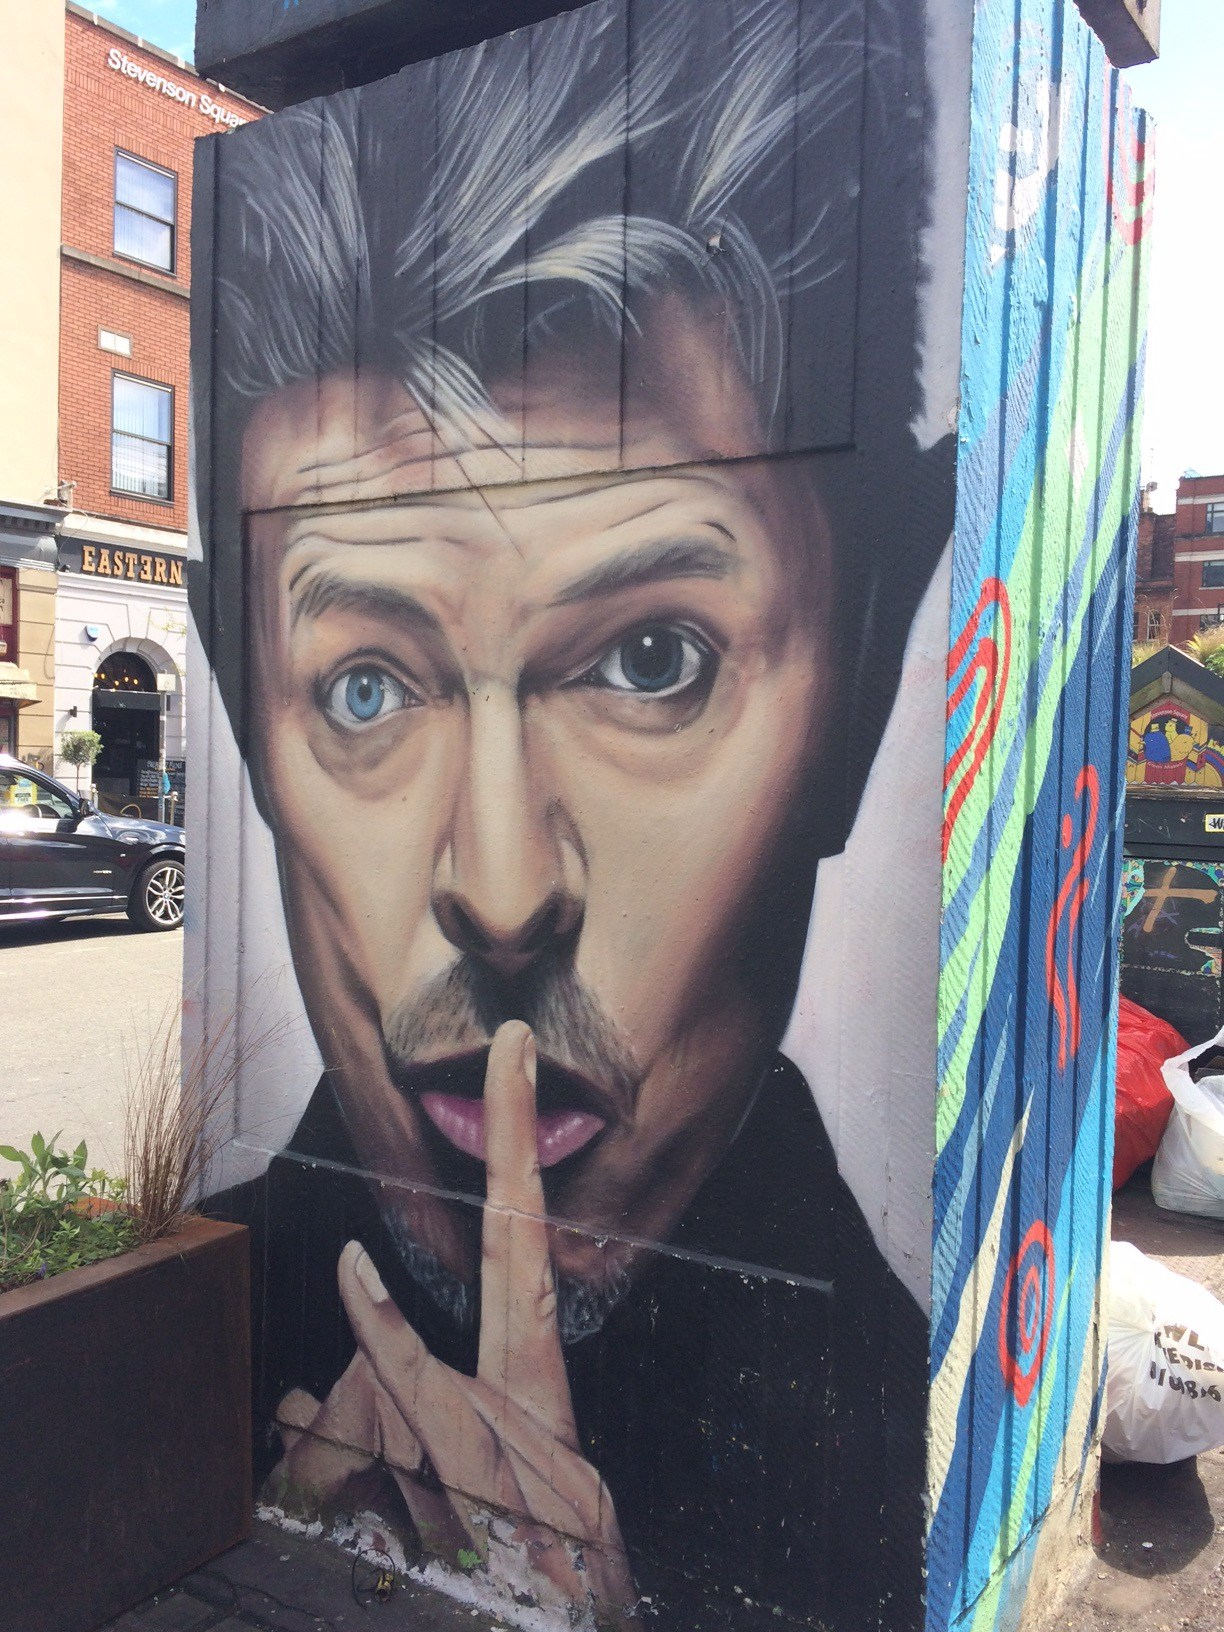 David Bowie, Street Art in Manchester's Northern Quarter